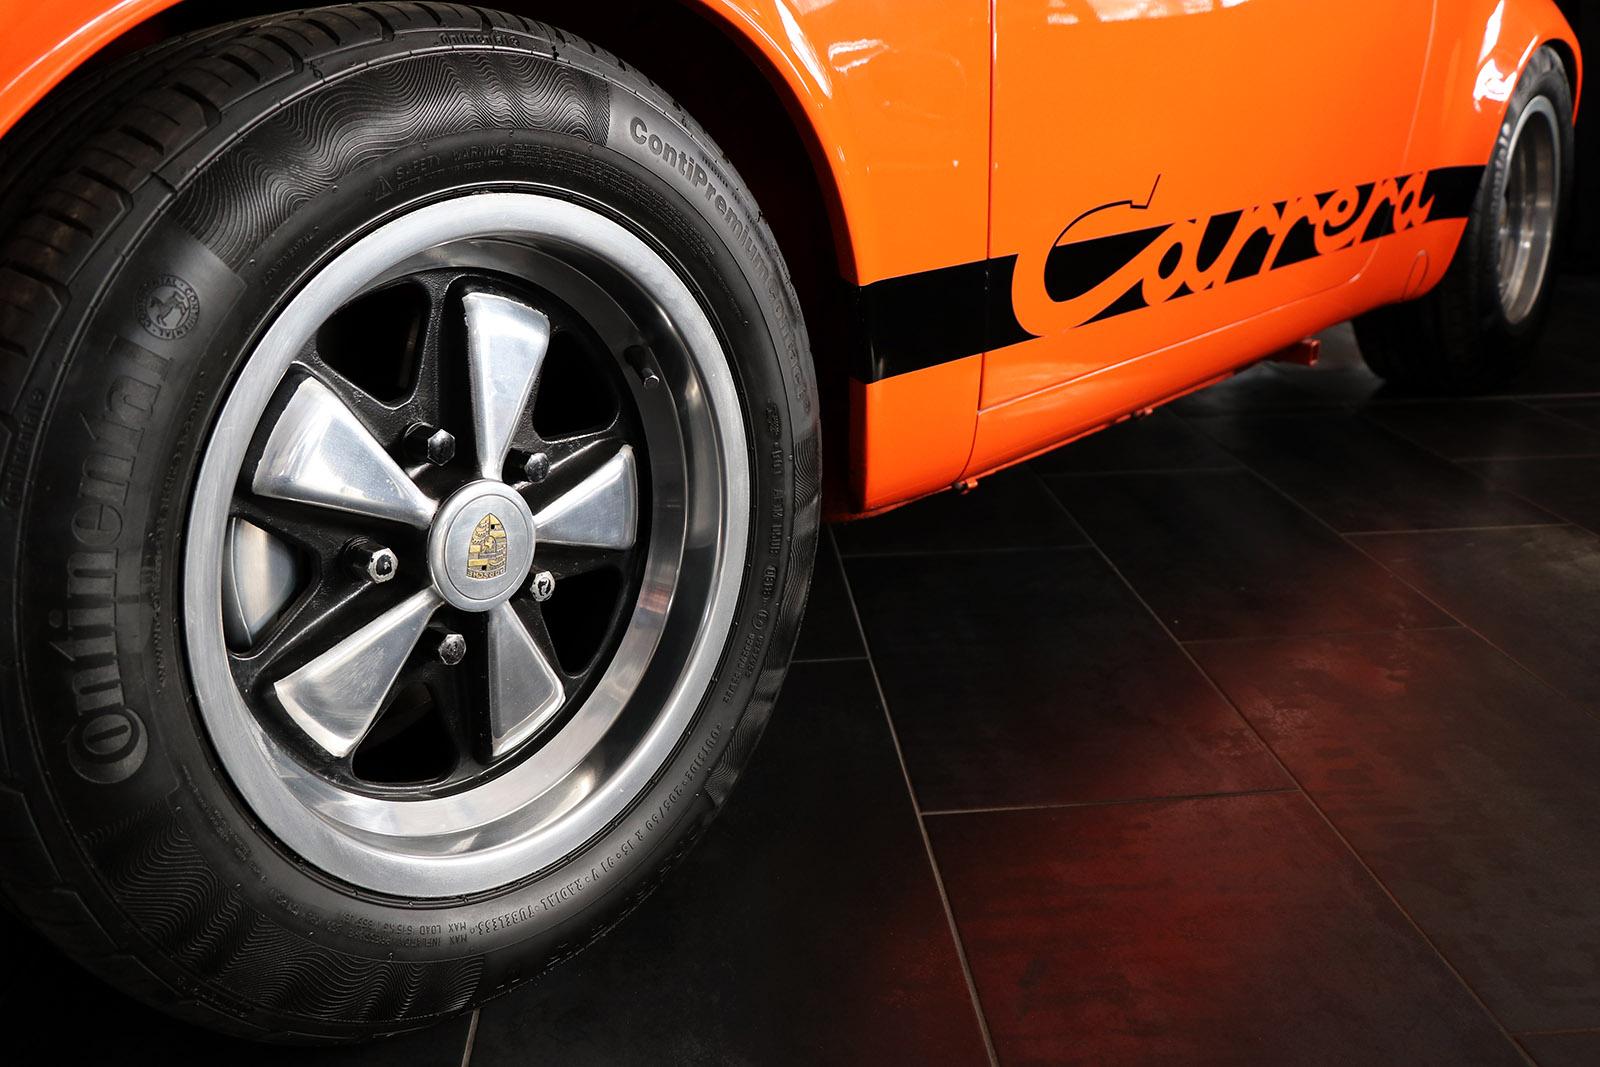 1972-Porsche 911 S-orange-evocation-sayer selection-5-web.jpg